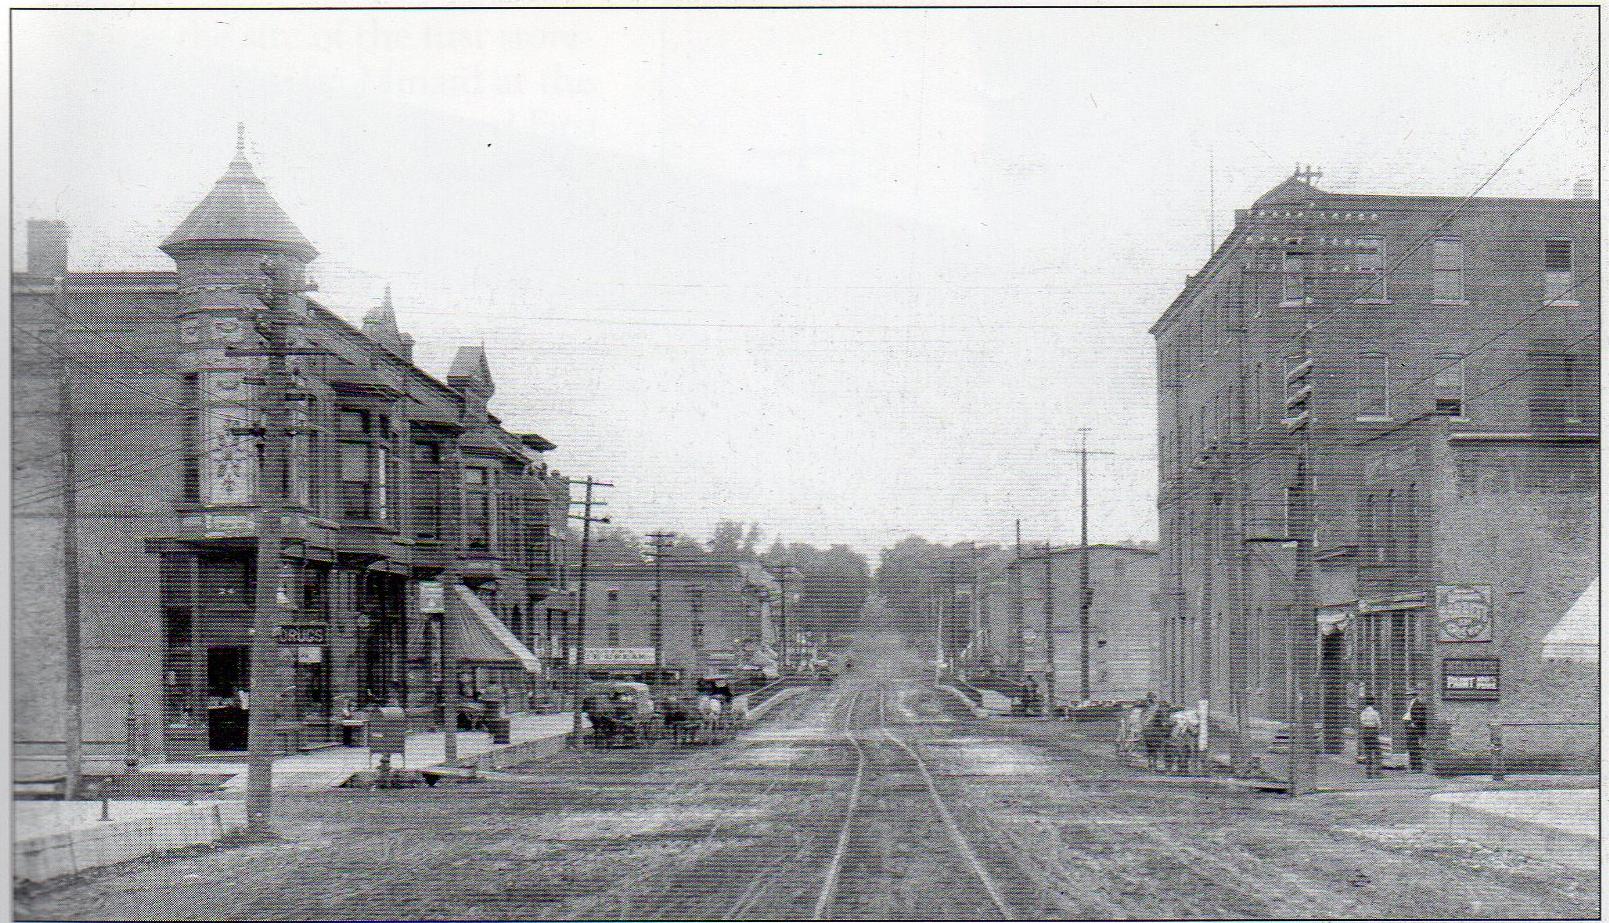 First Avenue Saint Charles